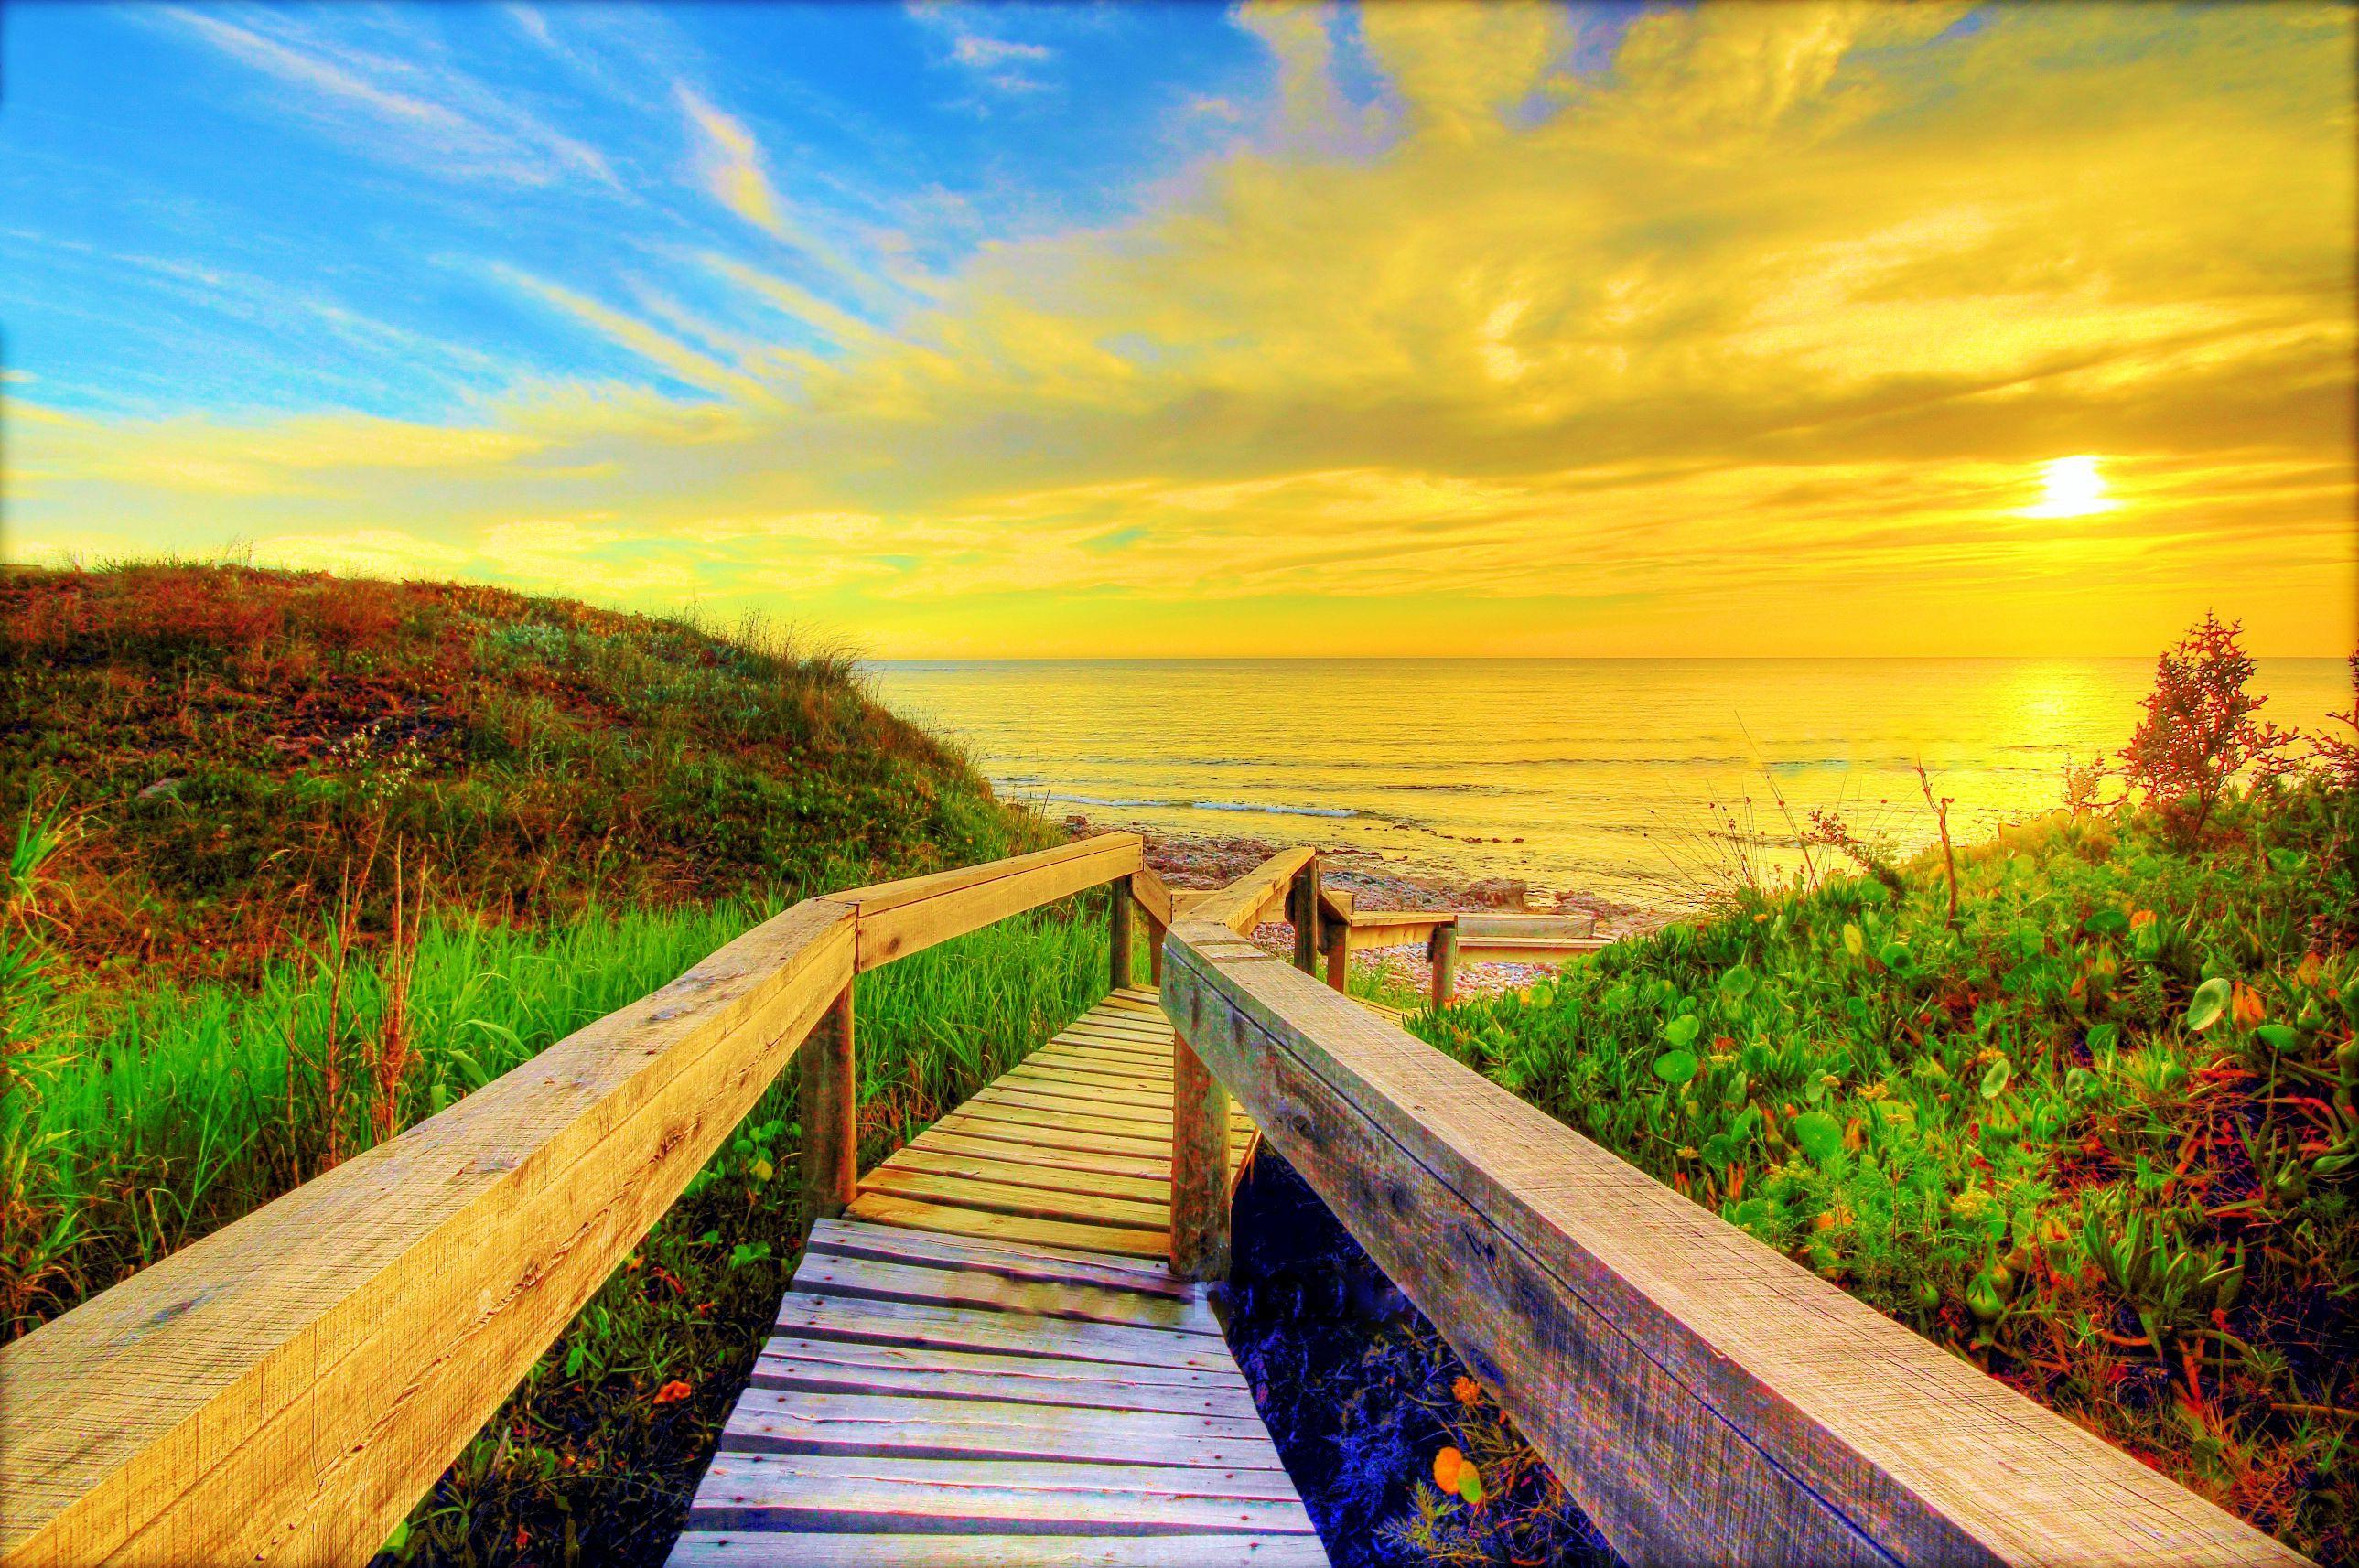 wallpaper hd,natural landscape,nature,boardwalk,sky,natural environment